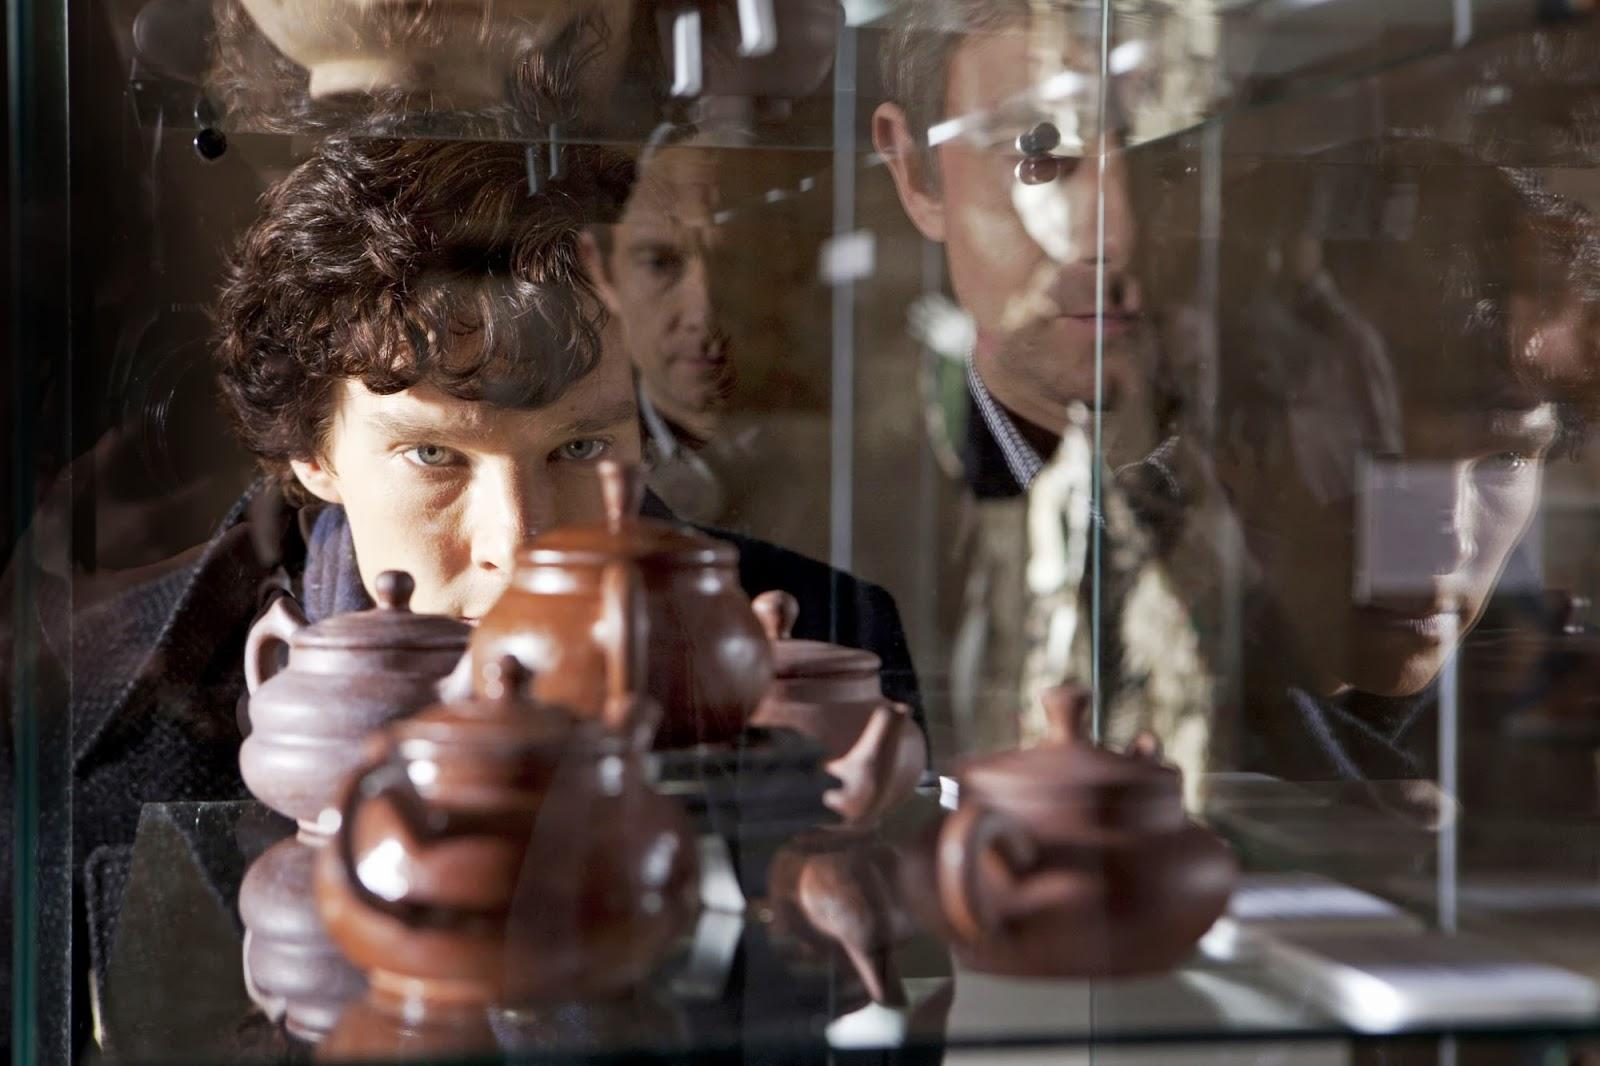 benedict_cumberbatch_as_sherlock_holmes_in_bbc_sherlock_season_1_episode_2_the_blind_banker_3.jpg